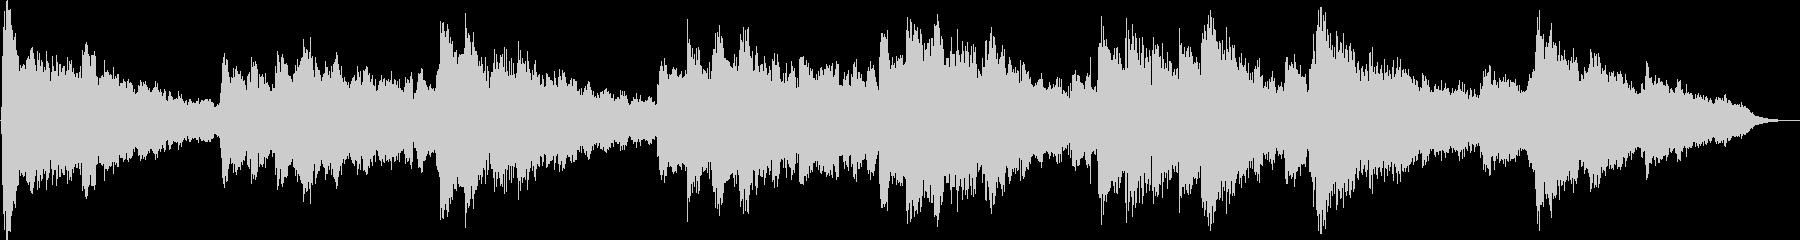 Gently warm BGM of flute main's unreproduced waveform